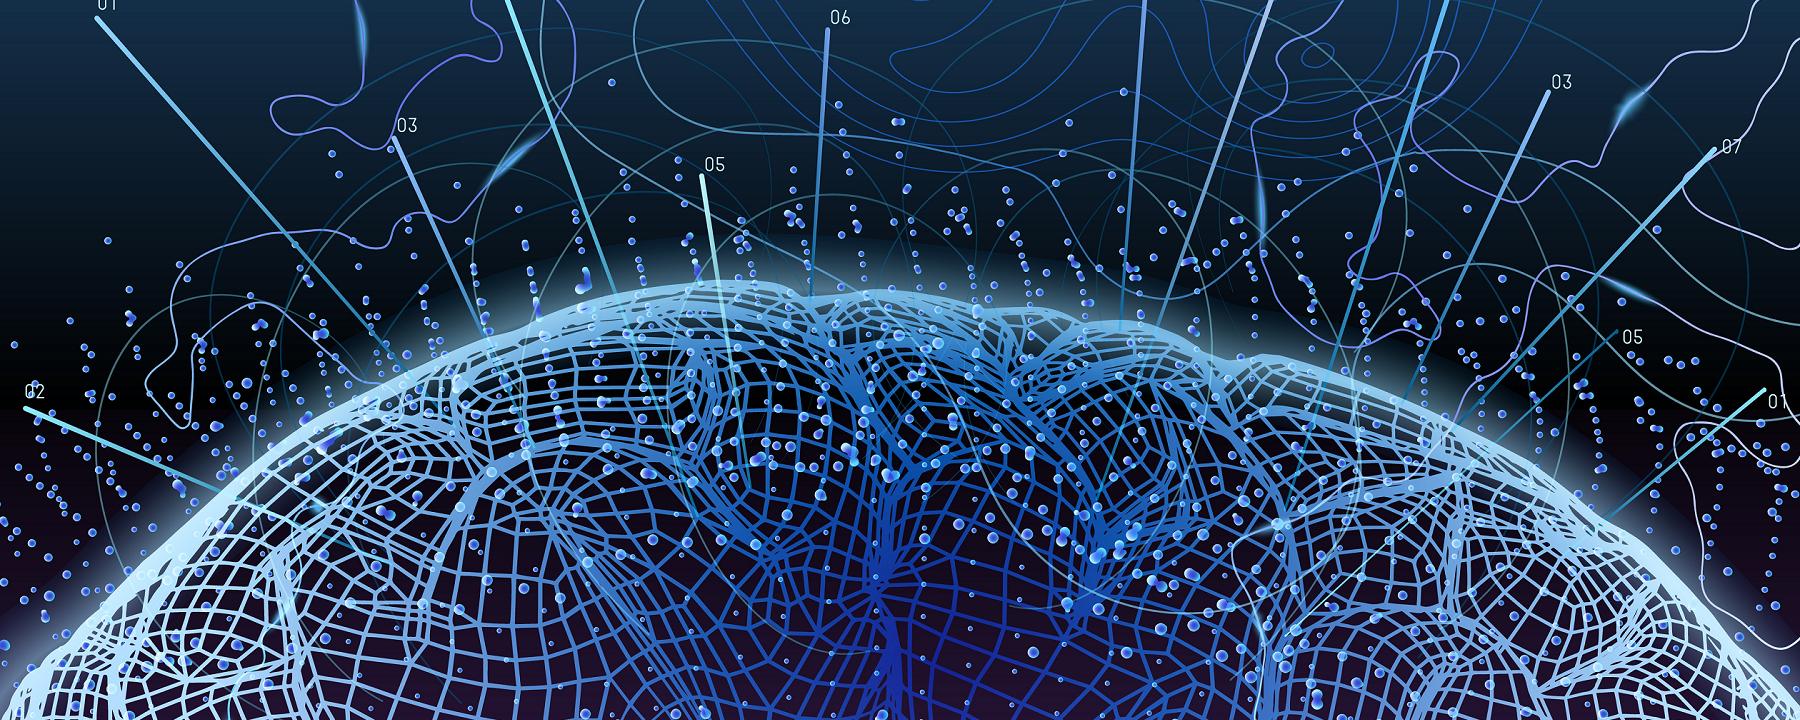 Deep Brain Stimulation Improves Depression Symptoms: Study